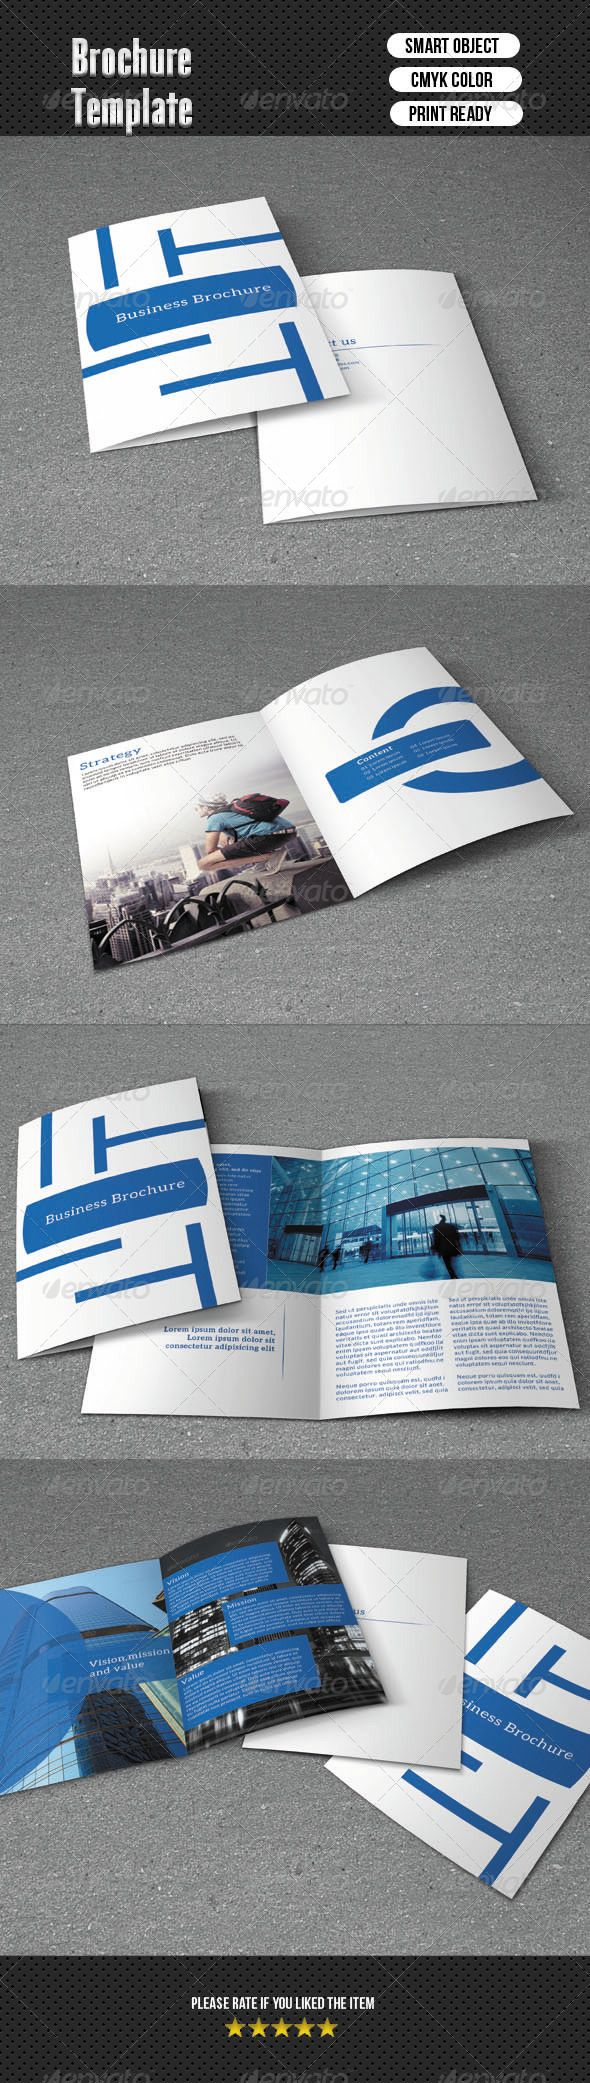 Bifold Beauty Salon Brochure-V07 | Psd Templates, Brochures And Ecommerce  Logo